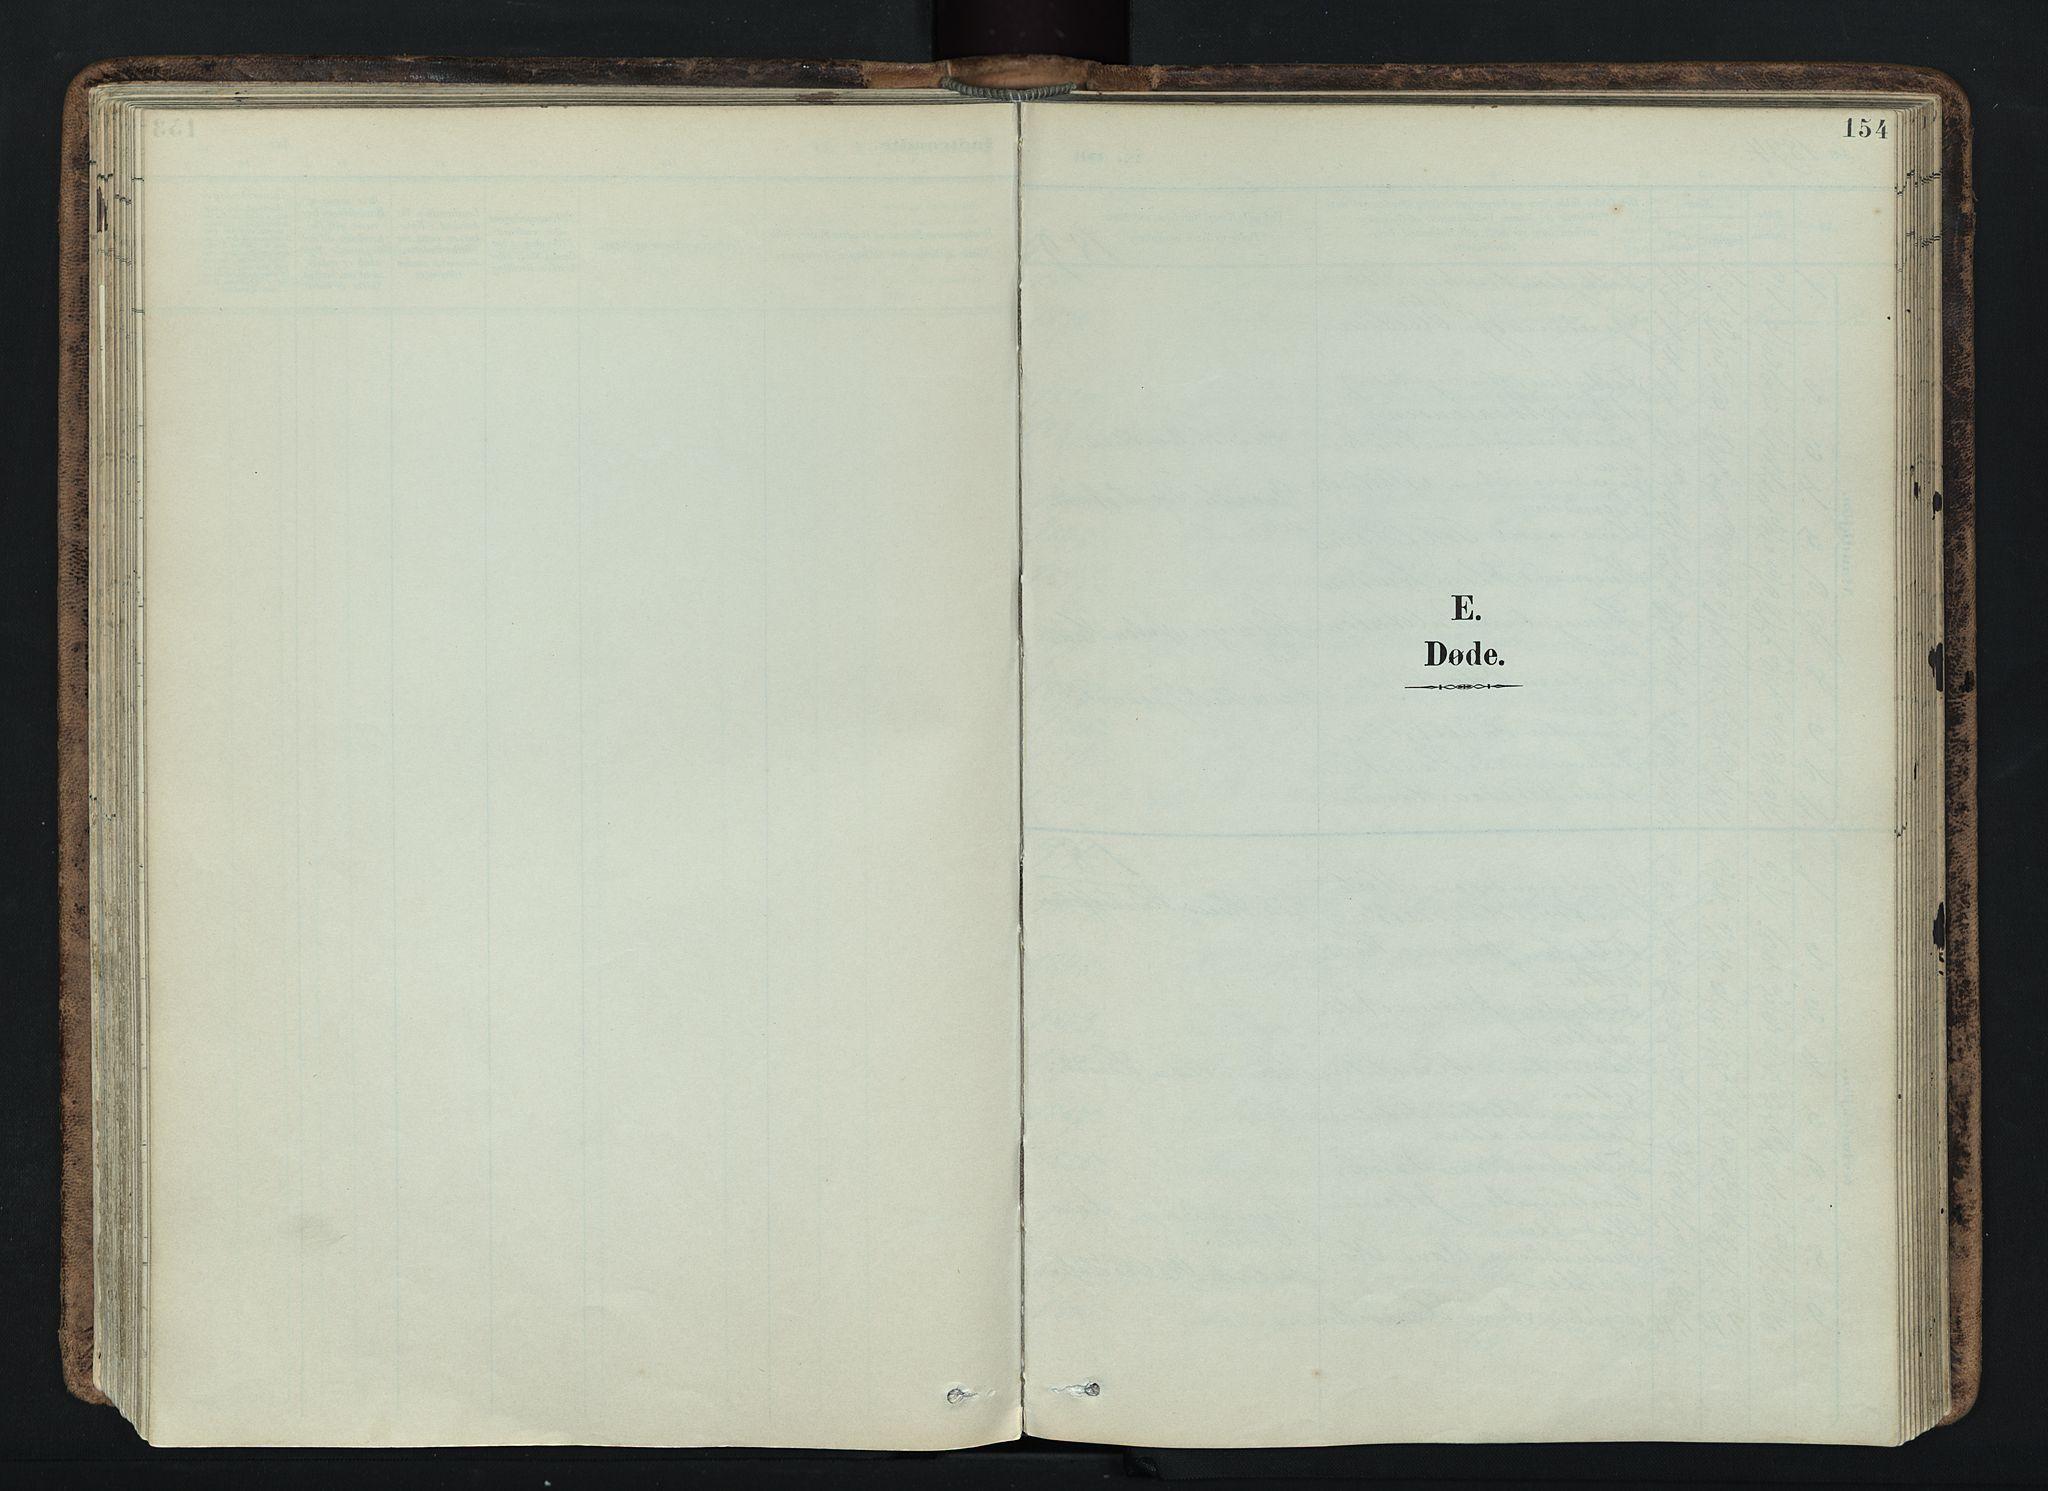 SAH, Vardal prestekontor, H/Ha/Haa/L0019: Ministerialbok nr. 19, 1893-1907, s. 154